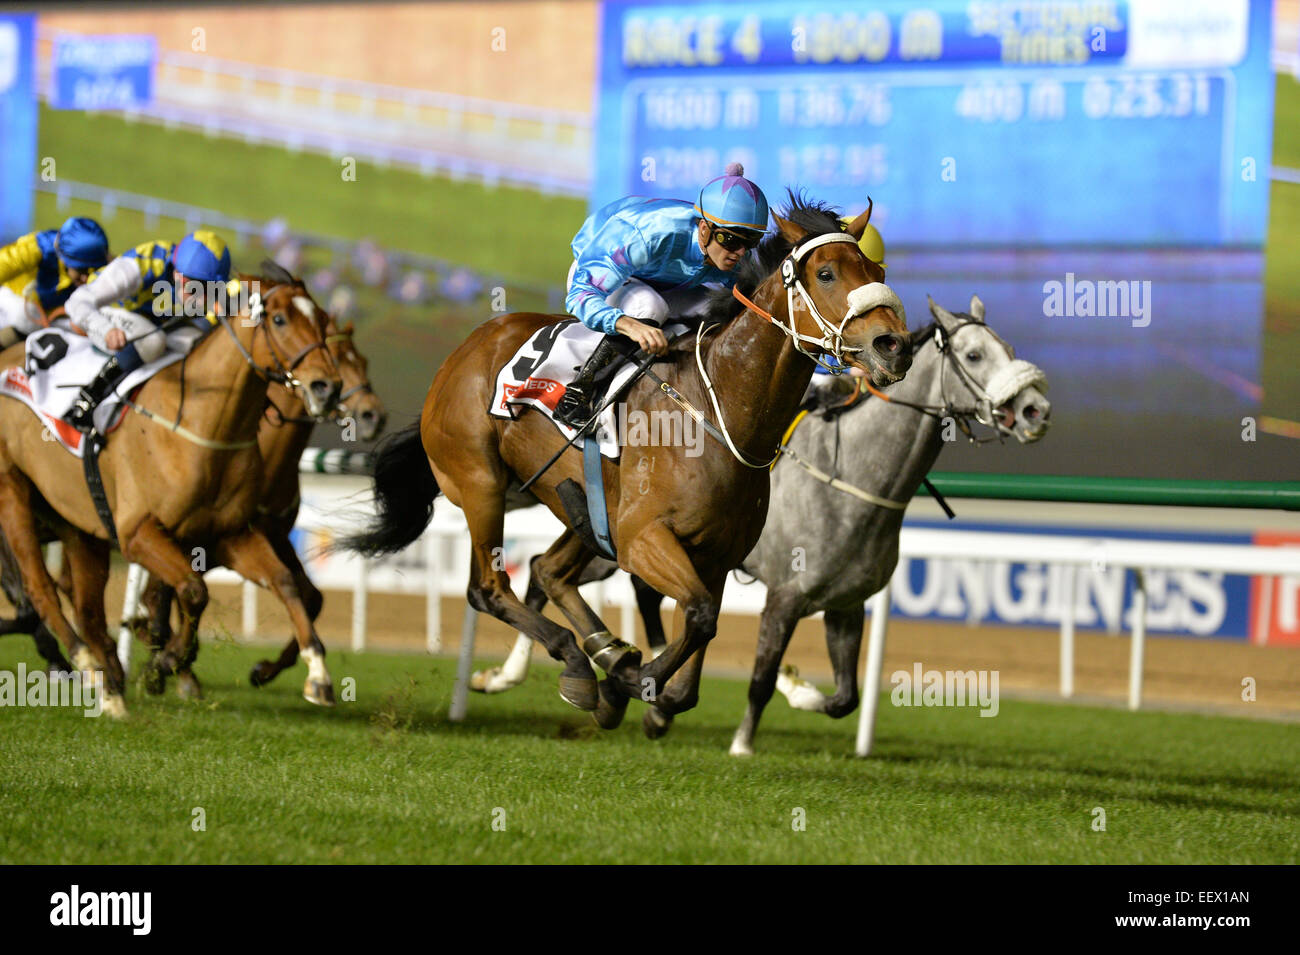 Dubai, UAE. 22nd January, 2015. UMGIYO ridden by Christophe Soumillon wins the  Gulf News Classifieds  Handicap - Stock Image